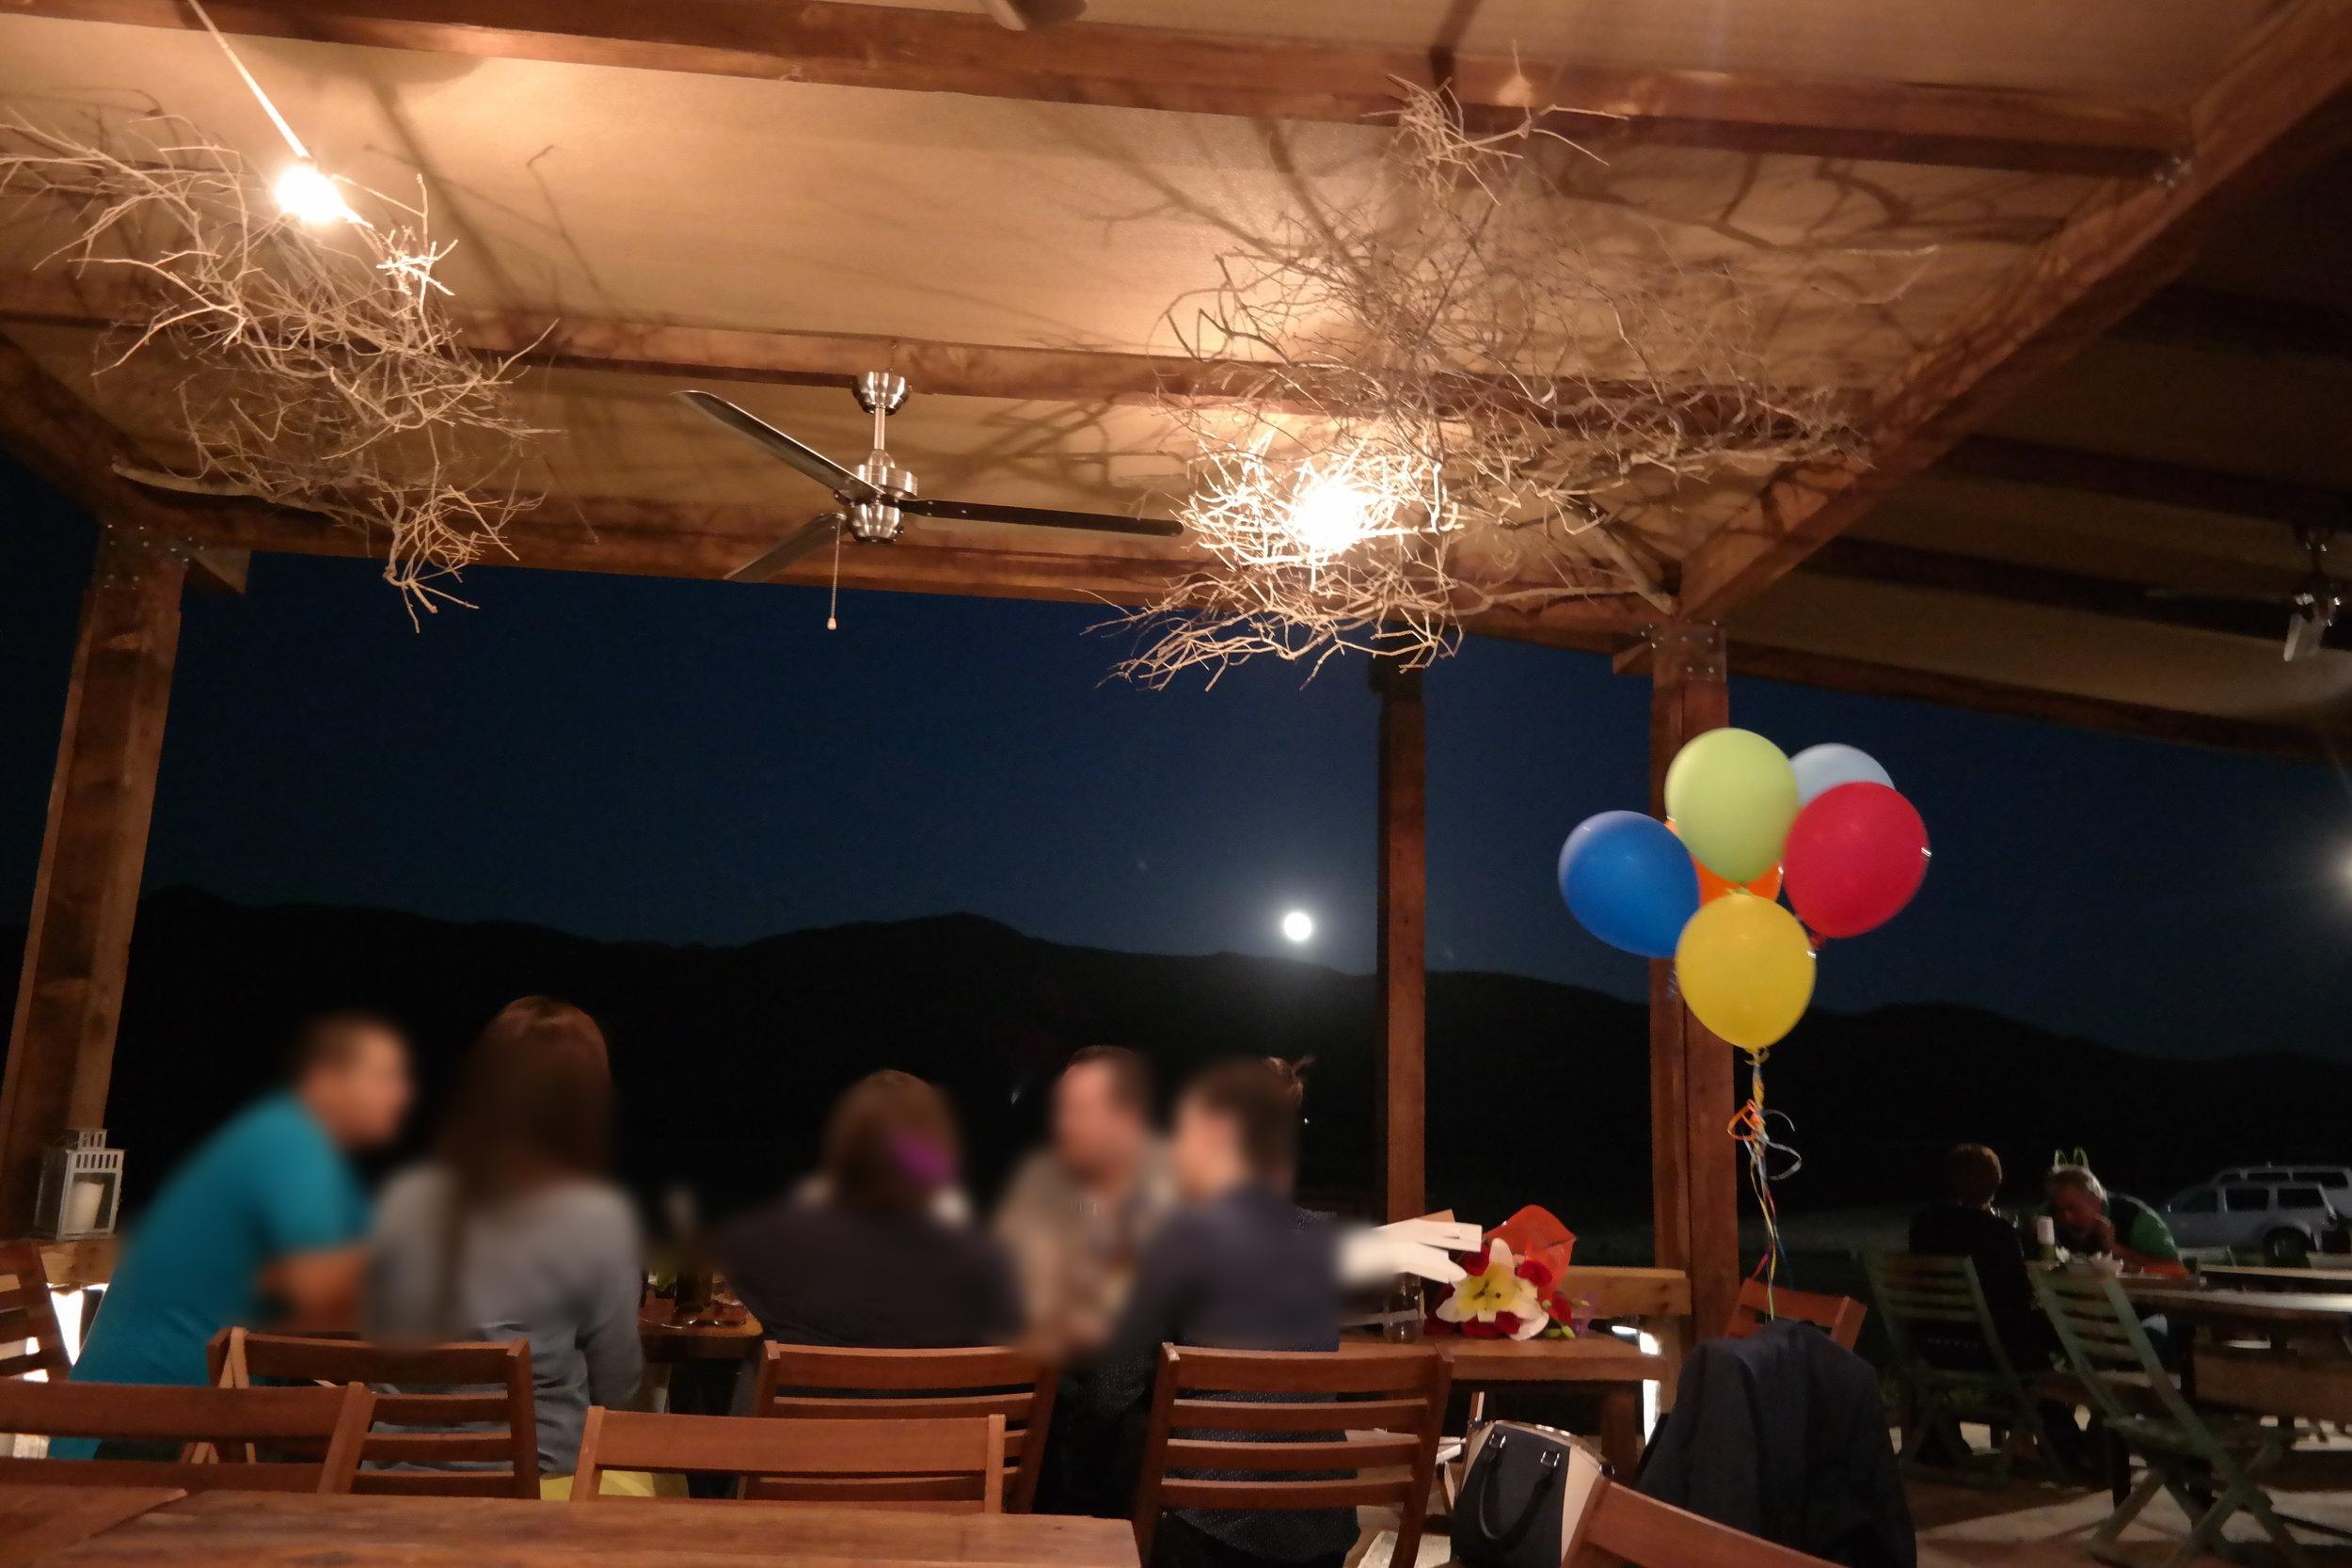 Moonlight over the perfect dinner at Finca Altozano